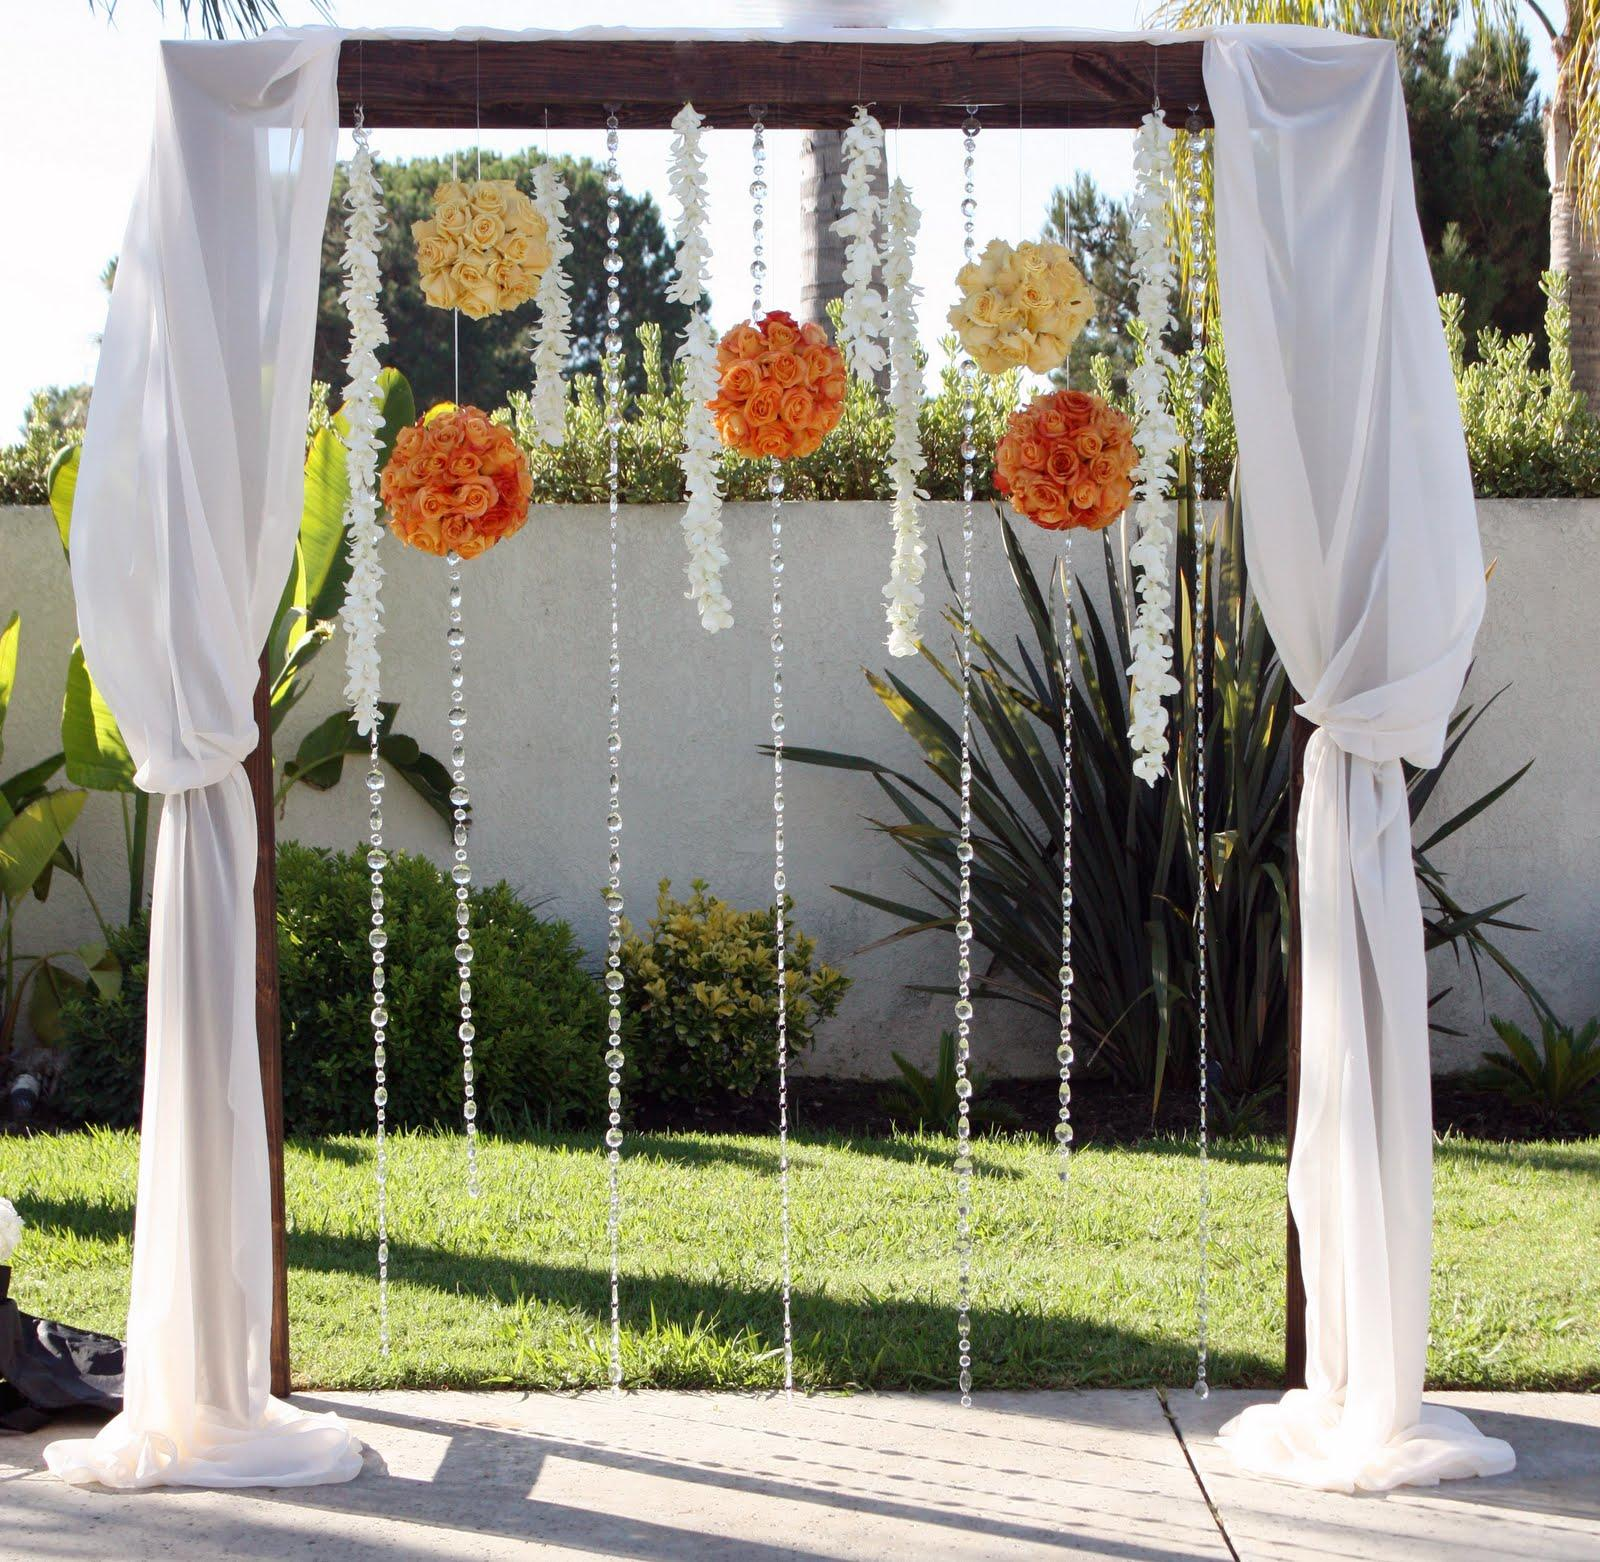 Katherinn's Blog: Decorated Fabric Wedding Arbor